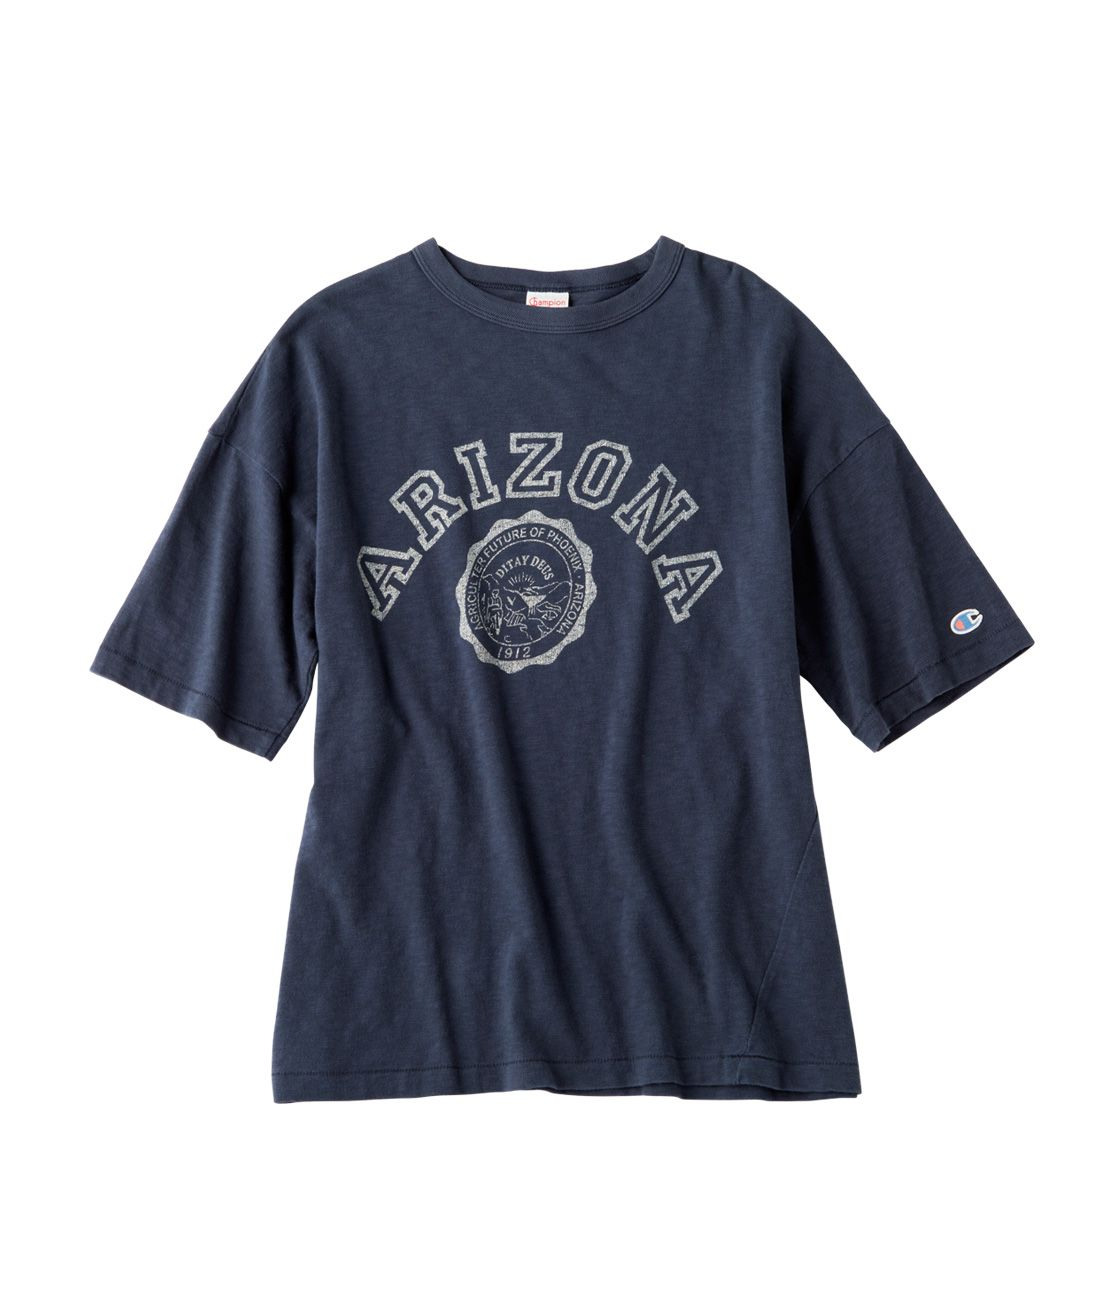 Vintage look t-shirt